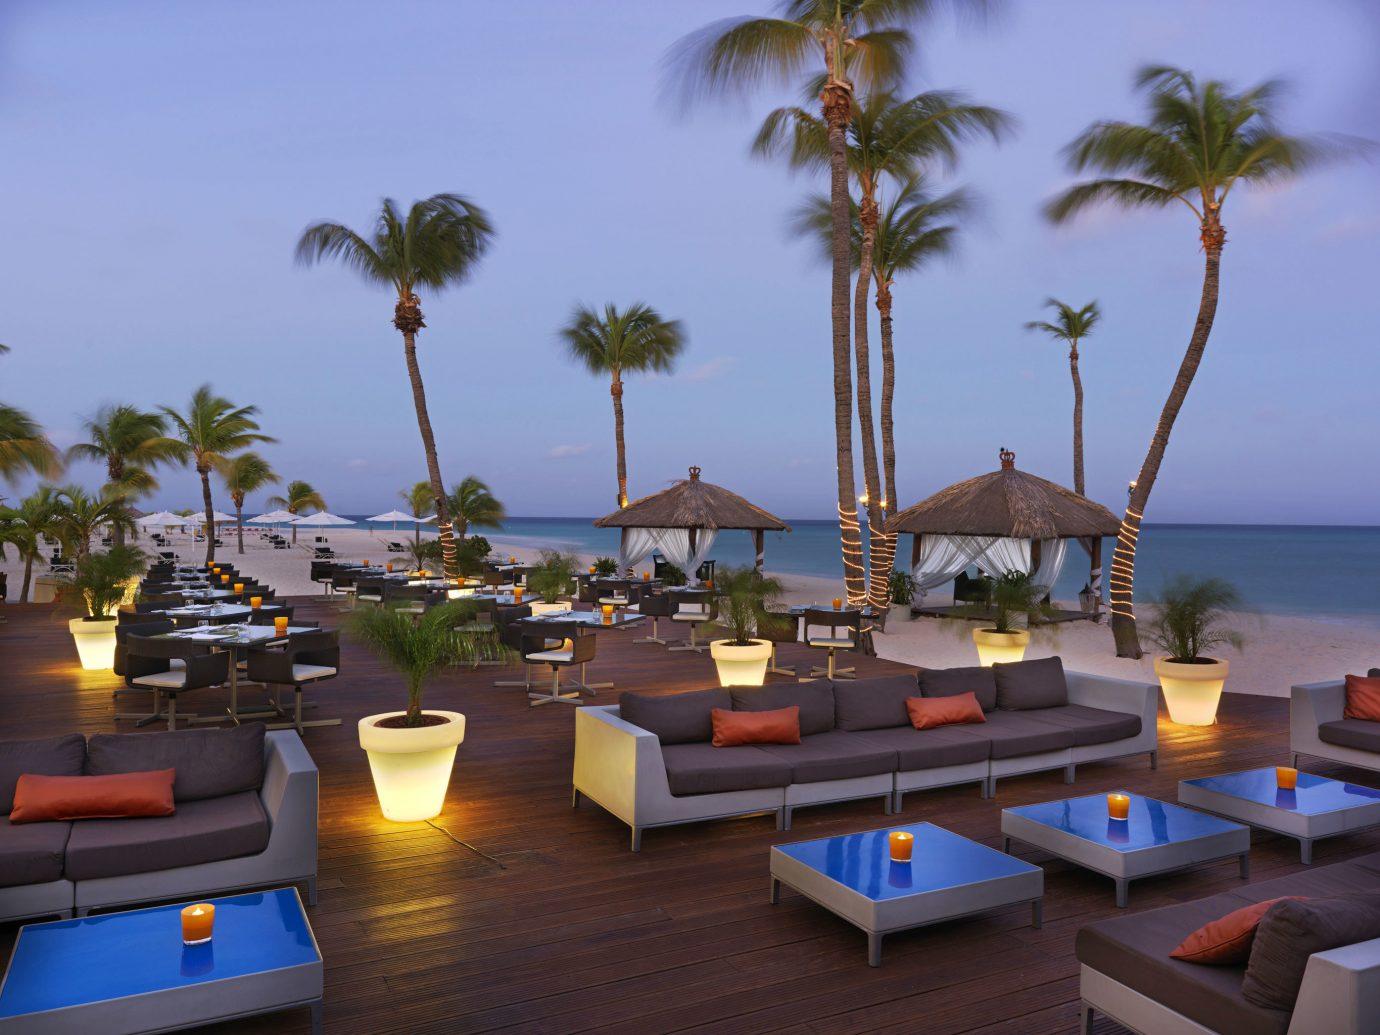 Aruba Bar Beachfront Dining Drink Eat Hotels Tropical tree sky Resort vacation palm estate arecales Beach caribbean condominium Villa Sea furniture plant